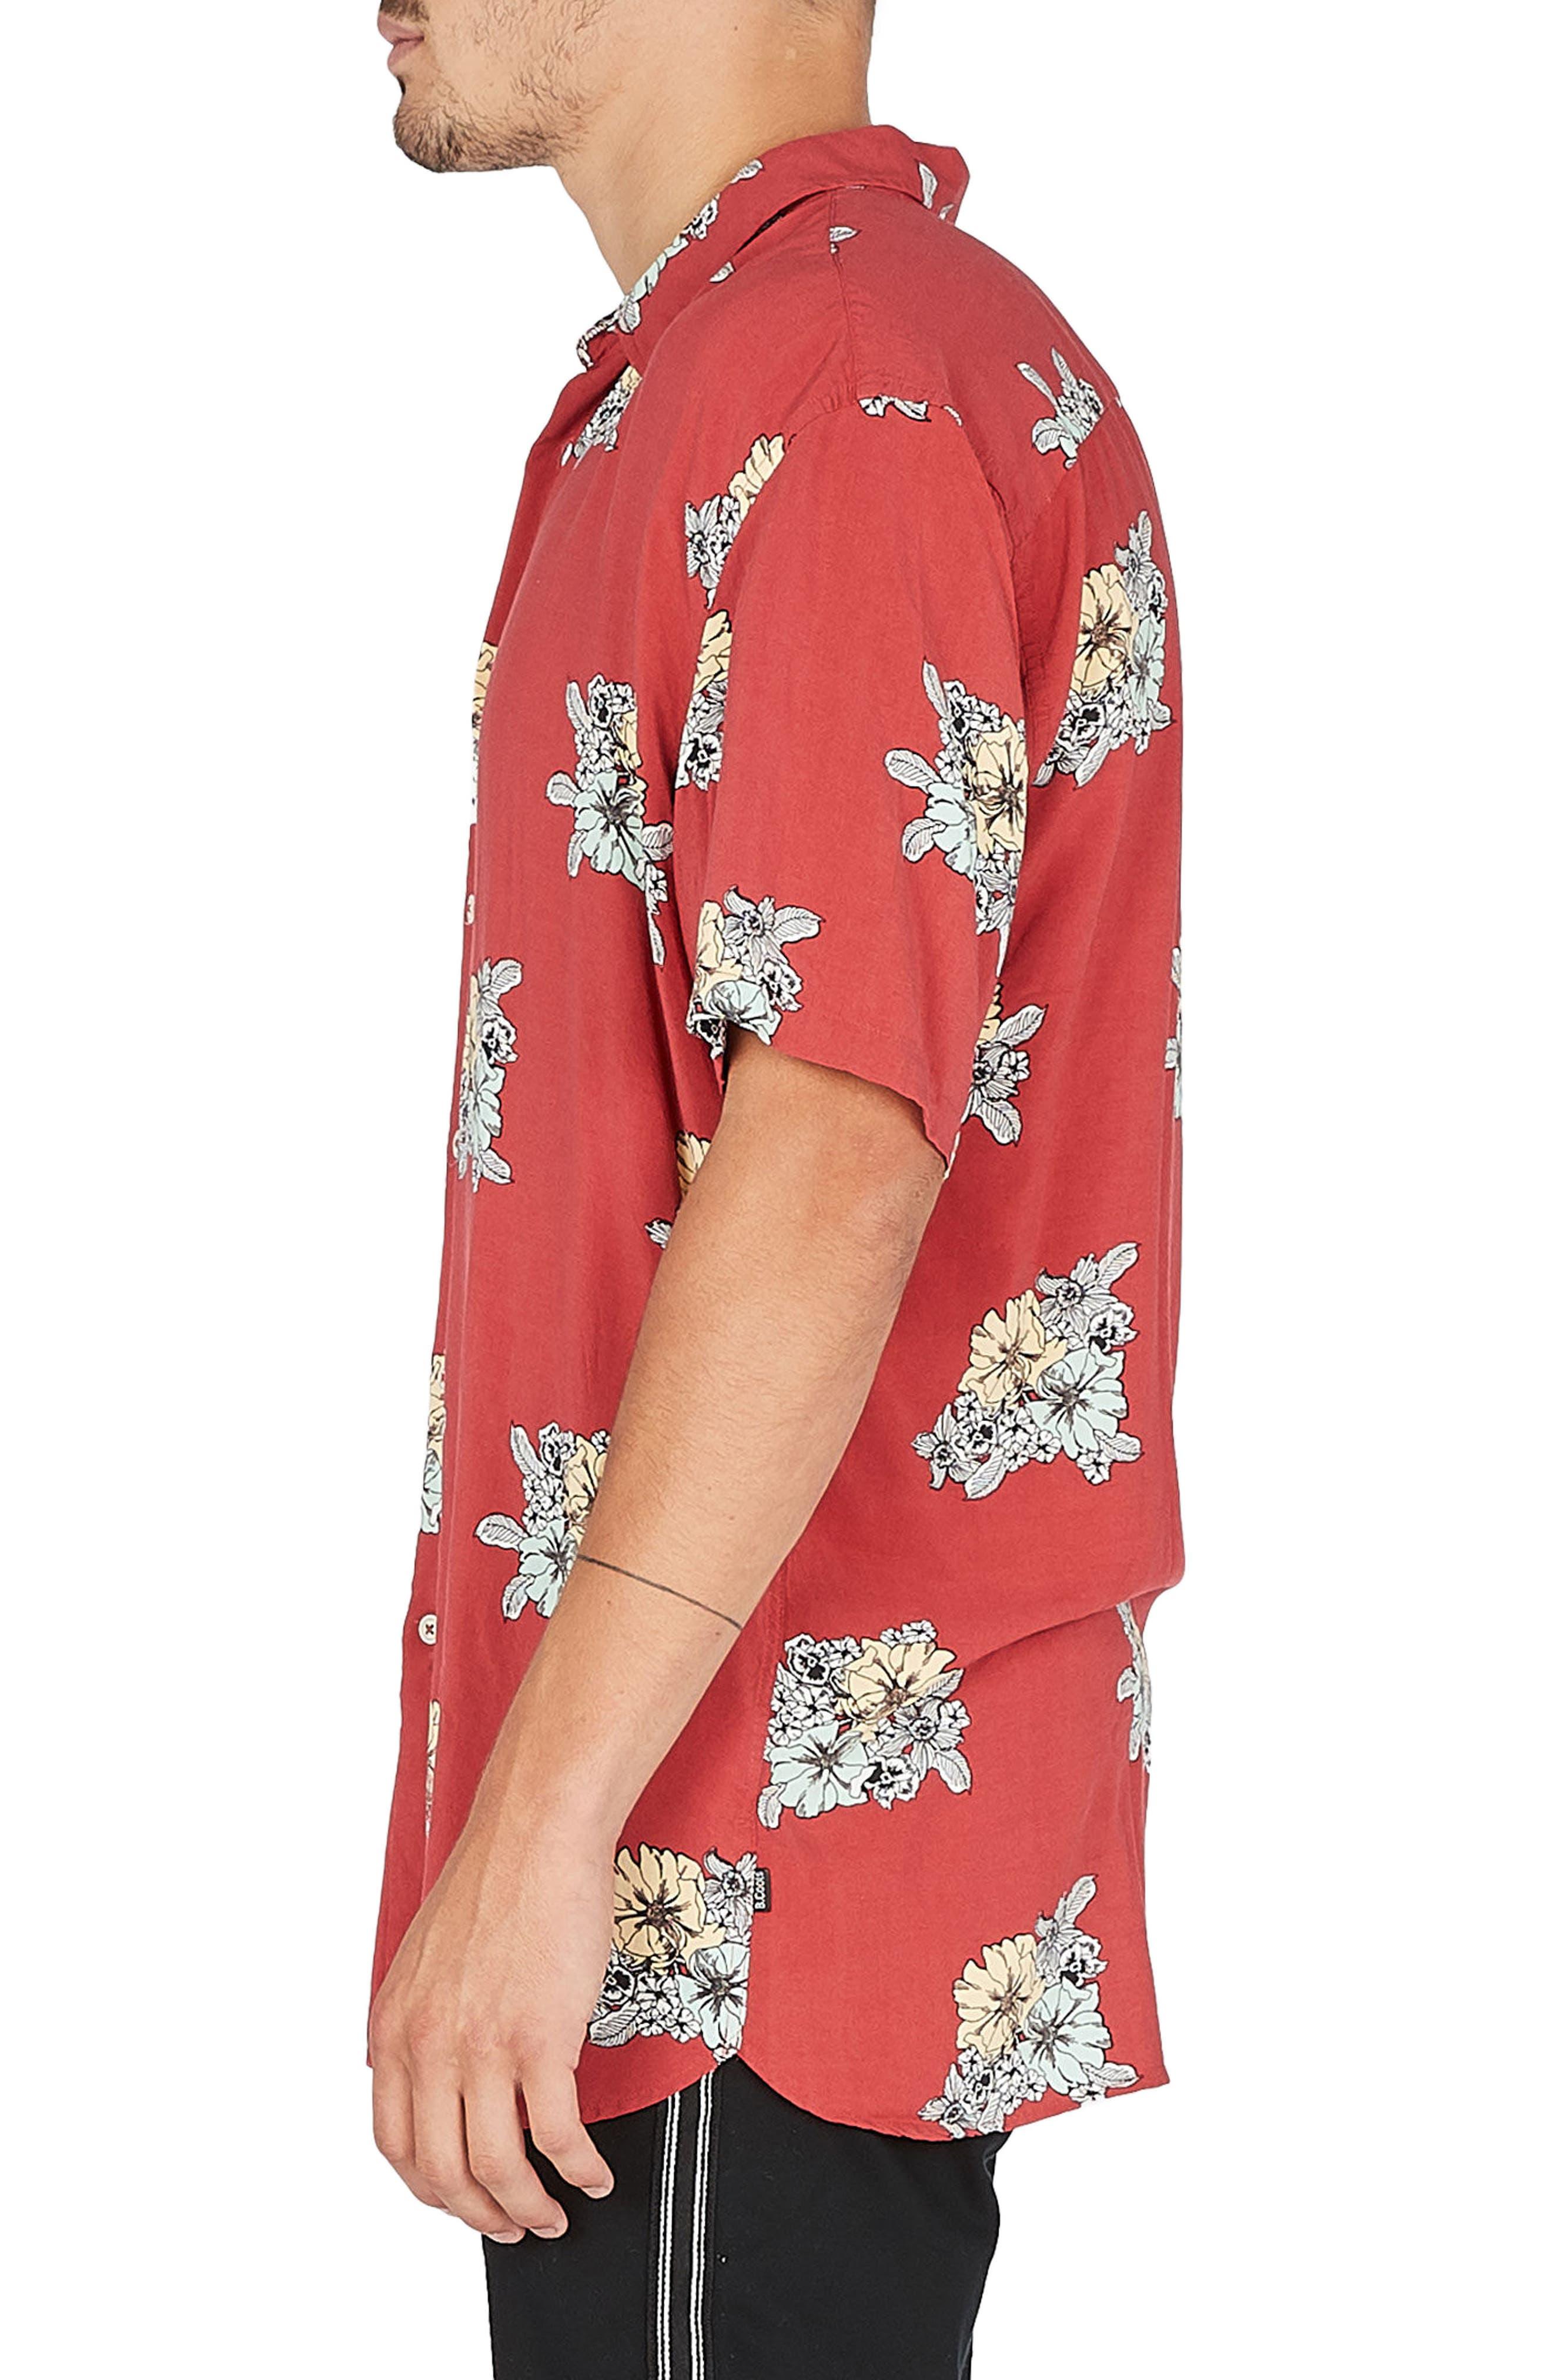 Holiday Woven Shirt,                             Alternate thumbnail 3, color,                             600